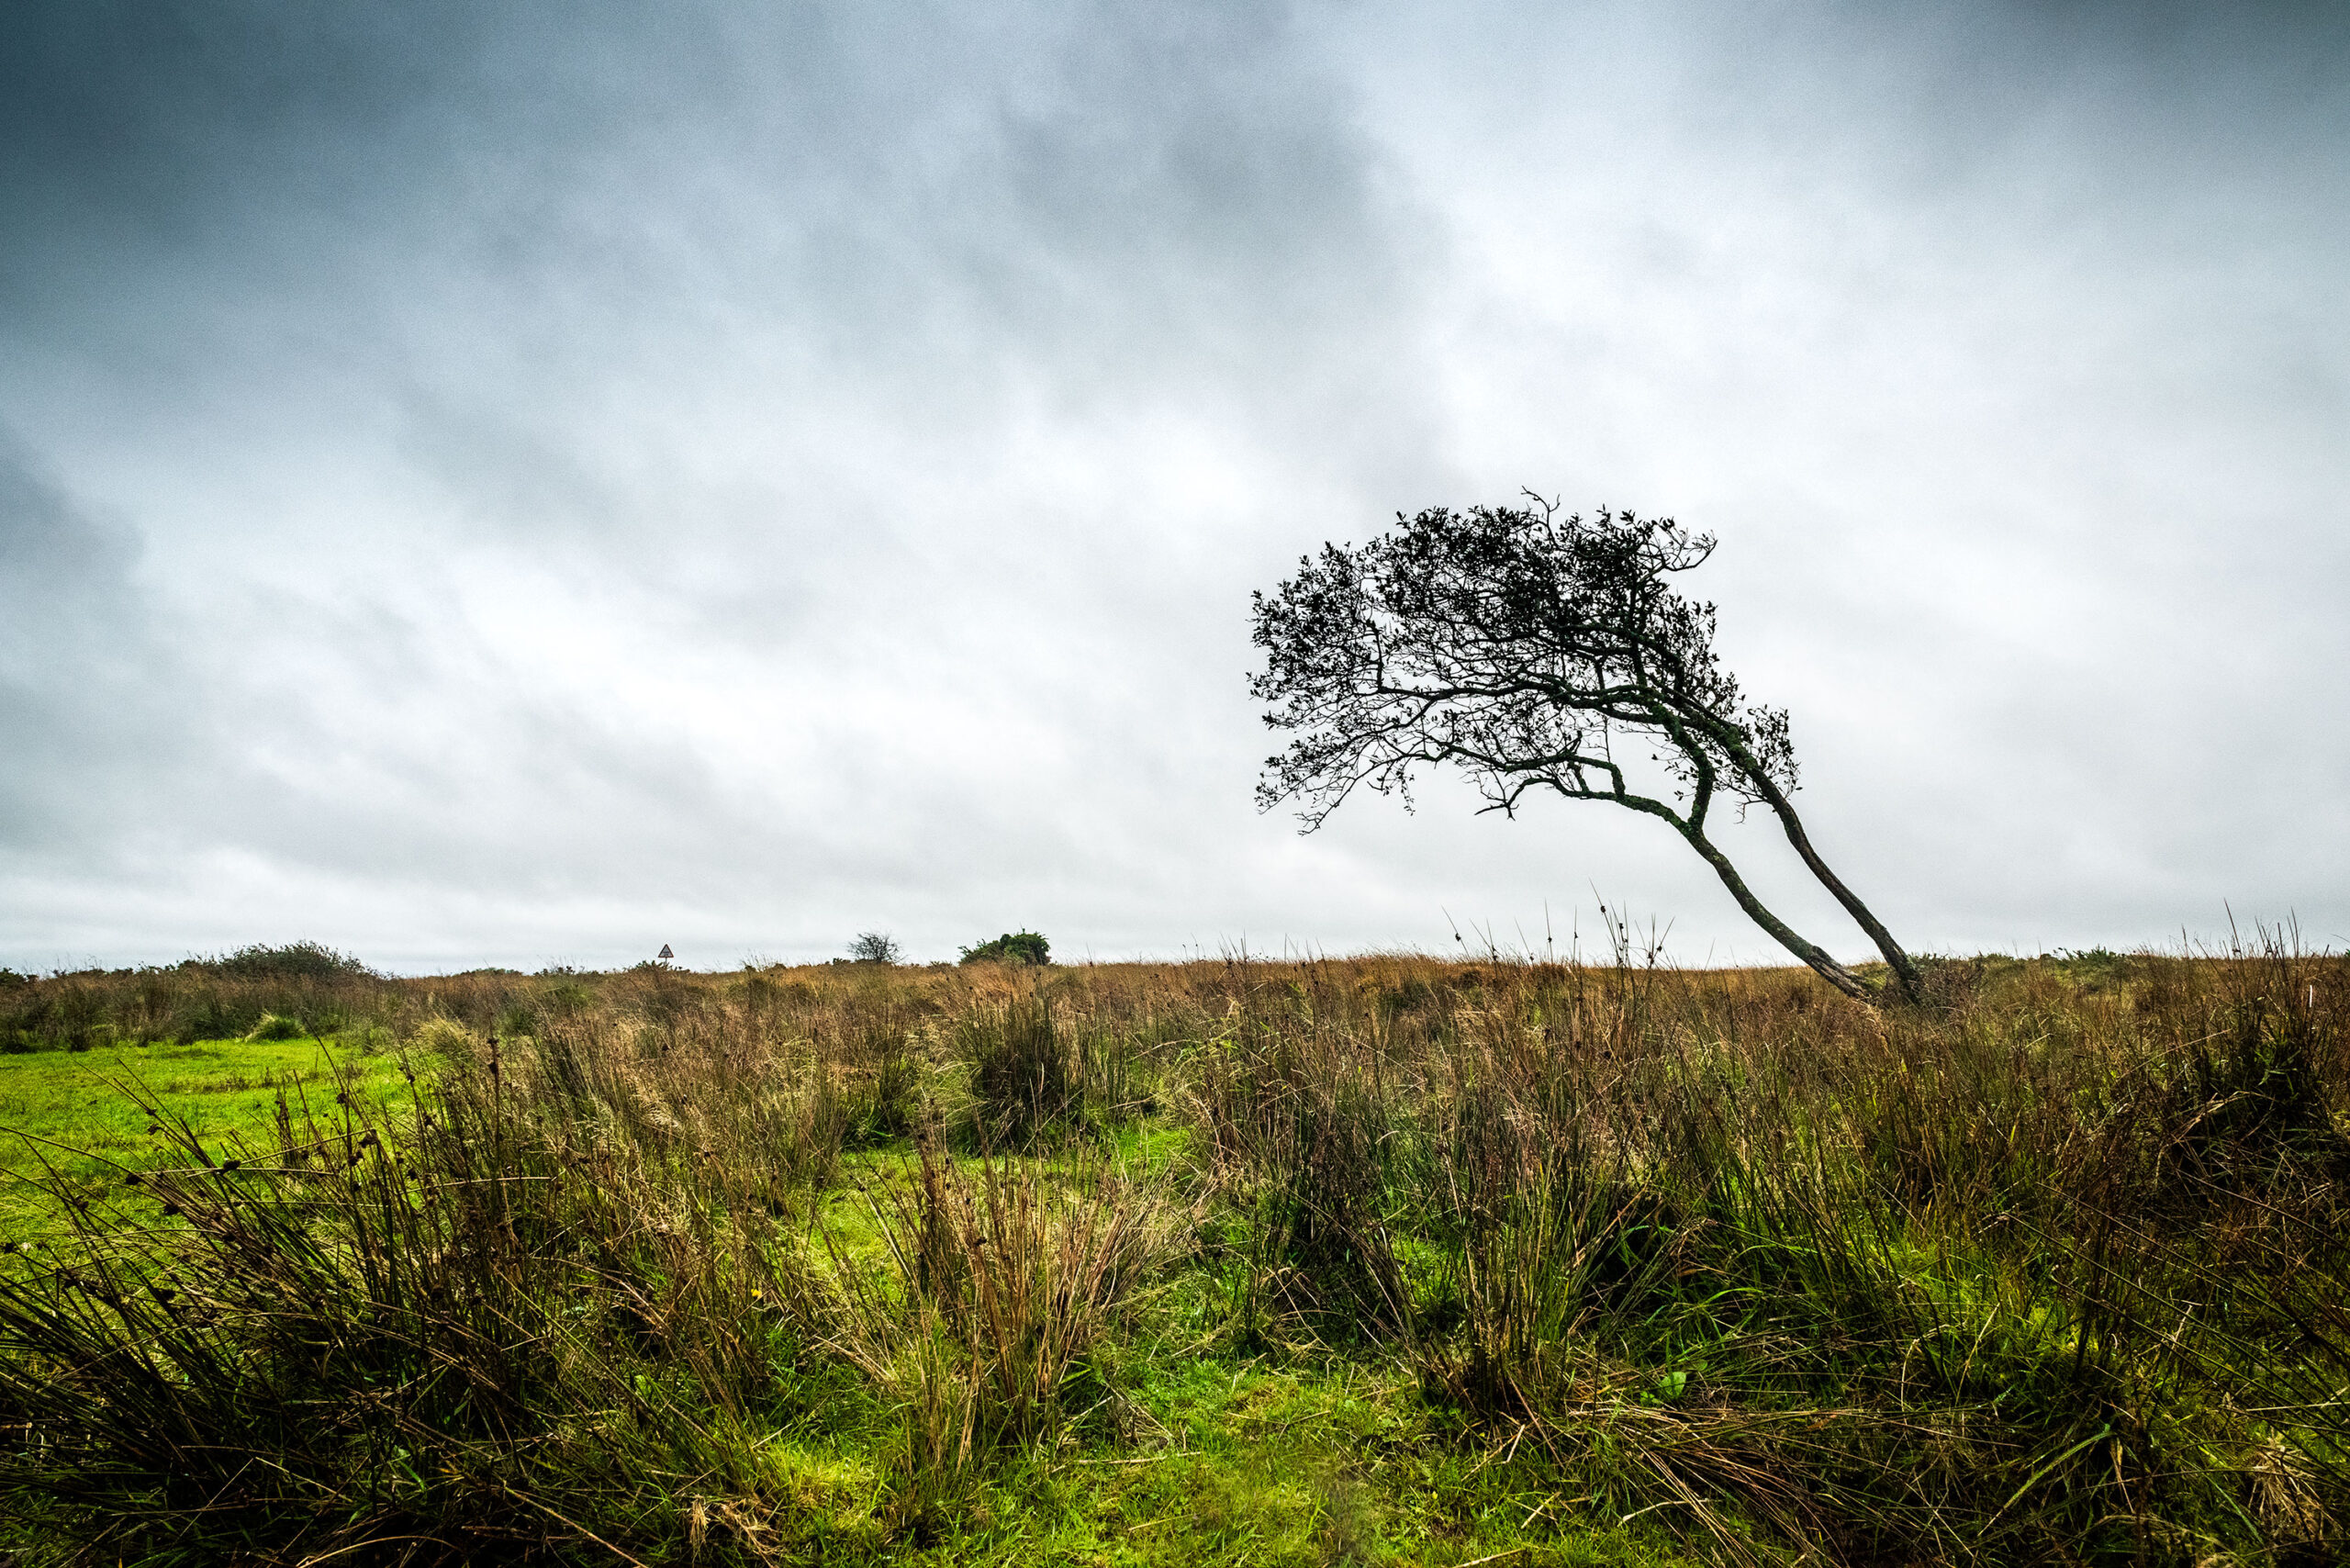 Dramatic and moody landscape photography. Image by Jennifer Esseiva.